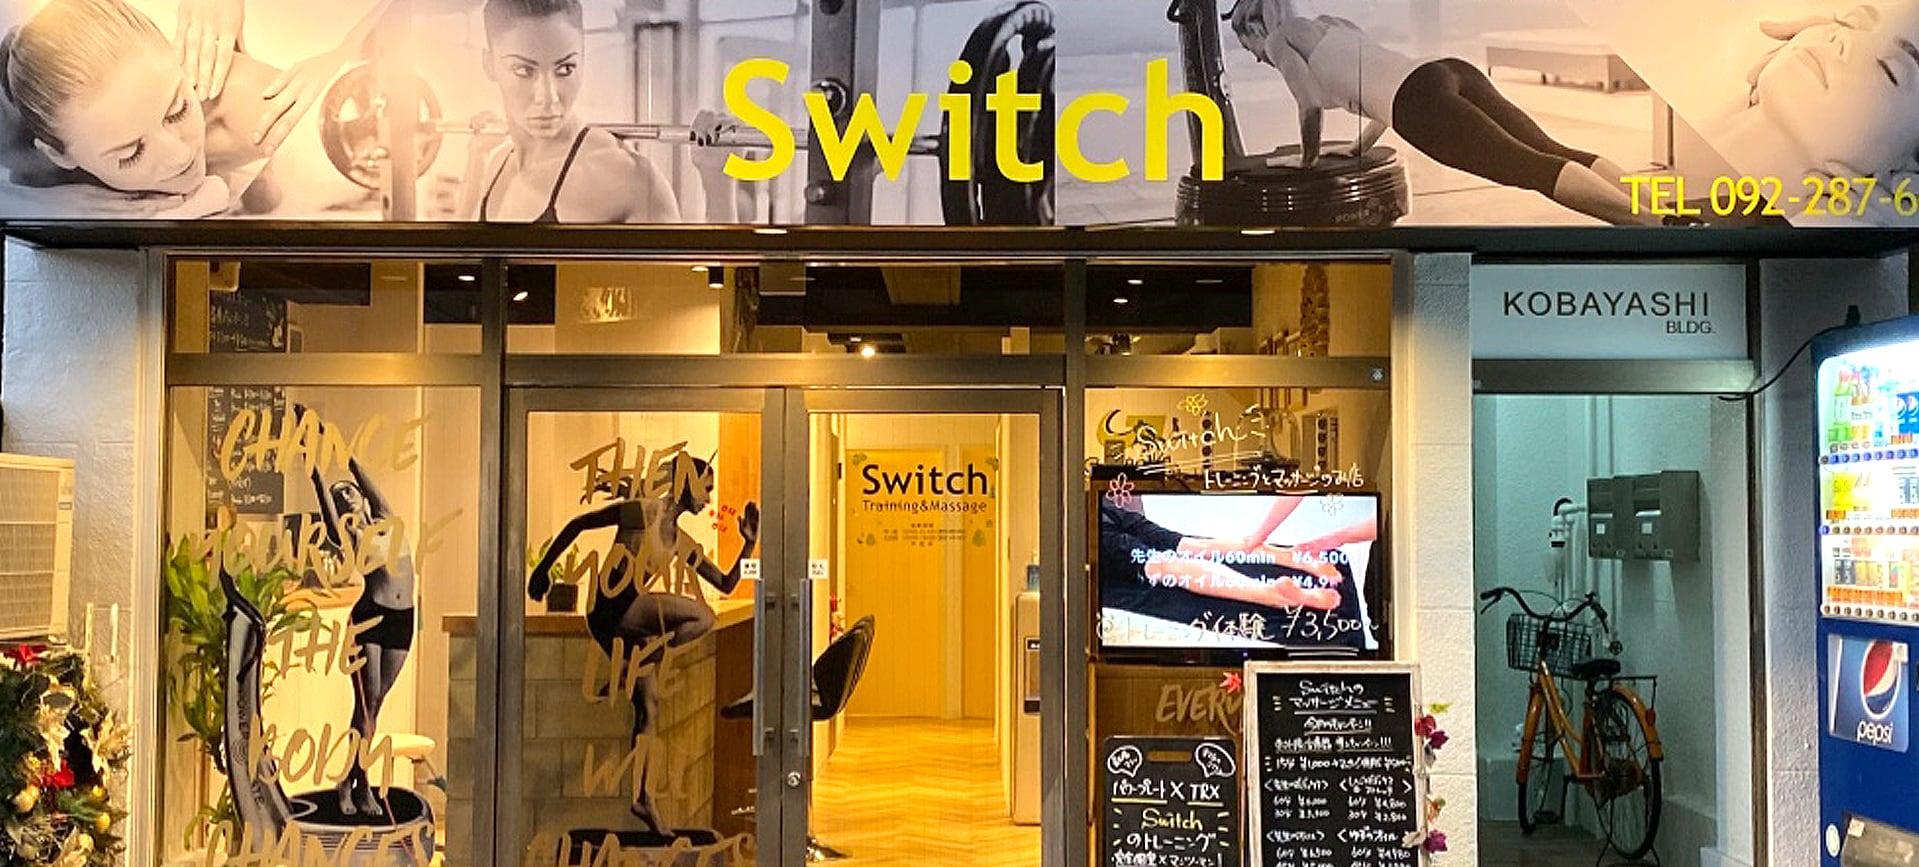 Switchの外観写真